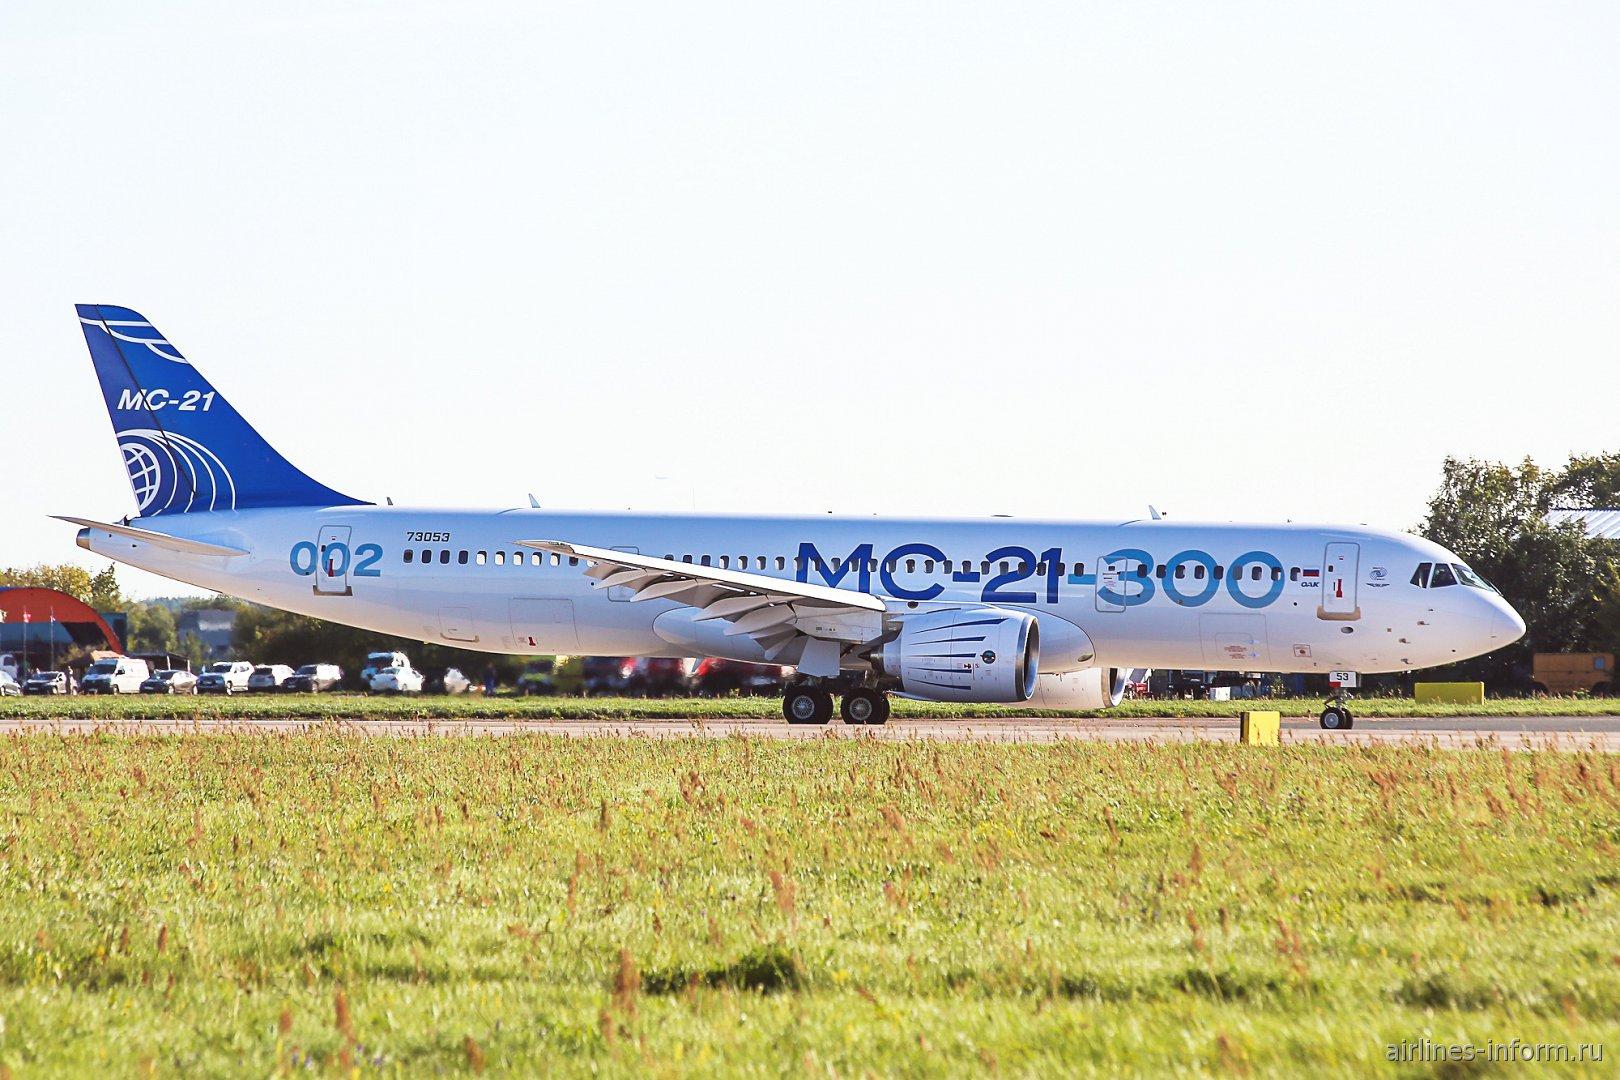 Авиалайнер МС-21-300 с бортовым номером 73053 на авиасалоне МАКС-2019